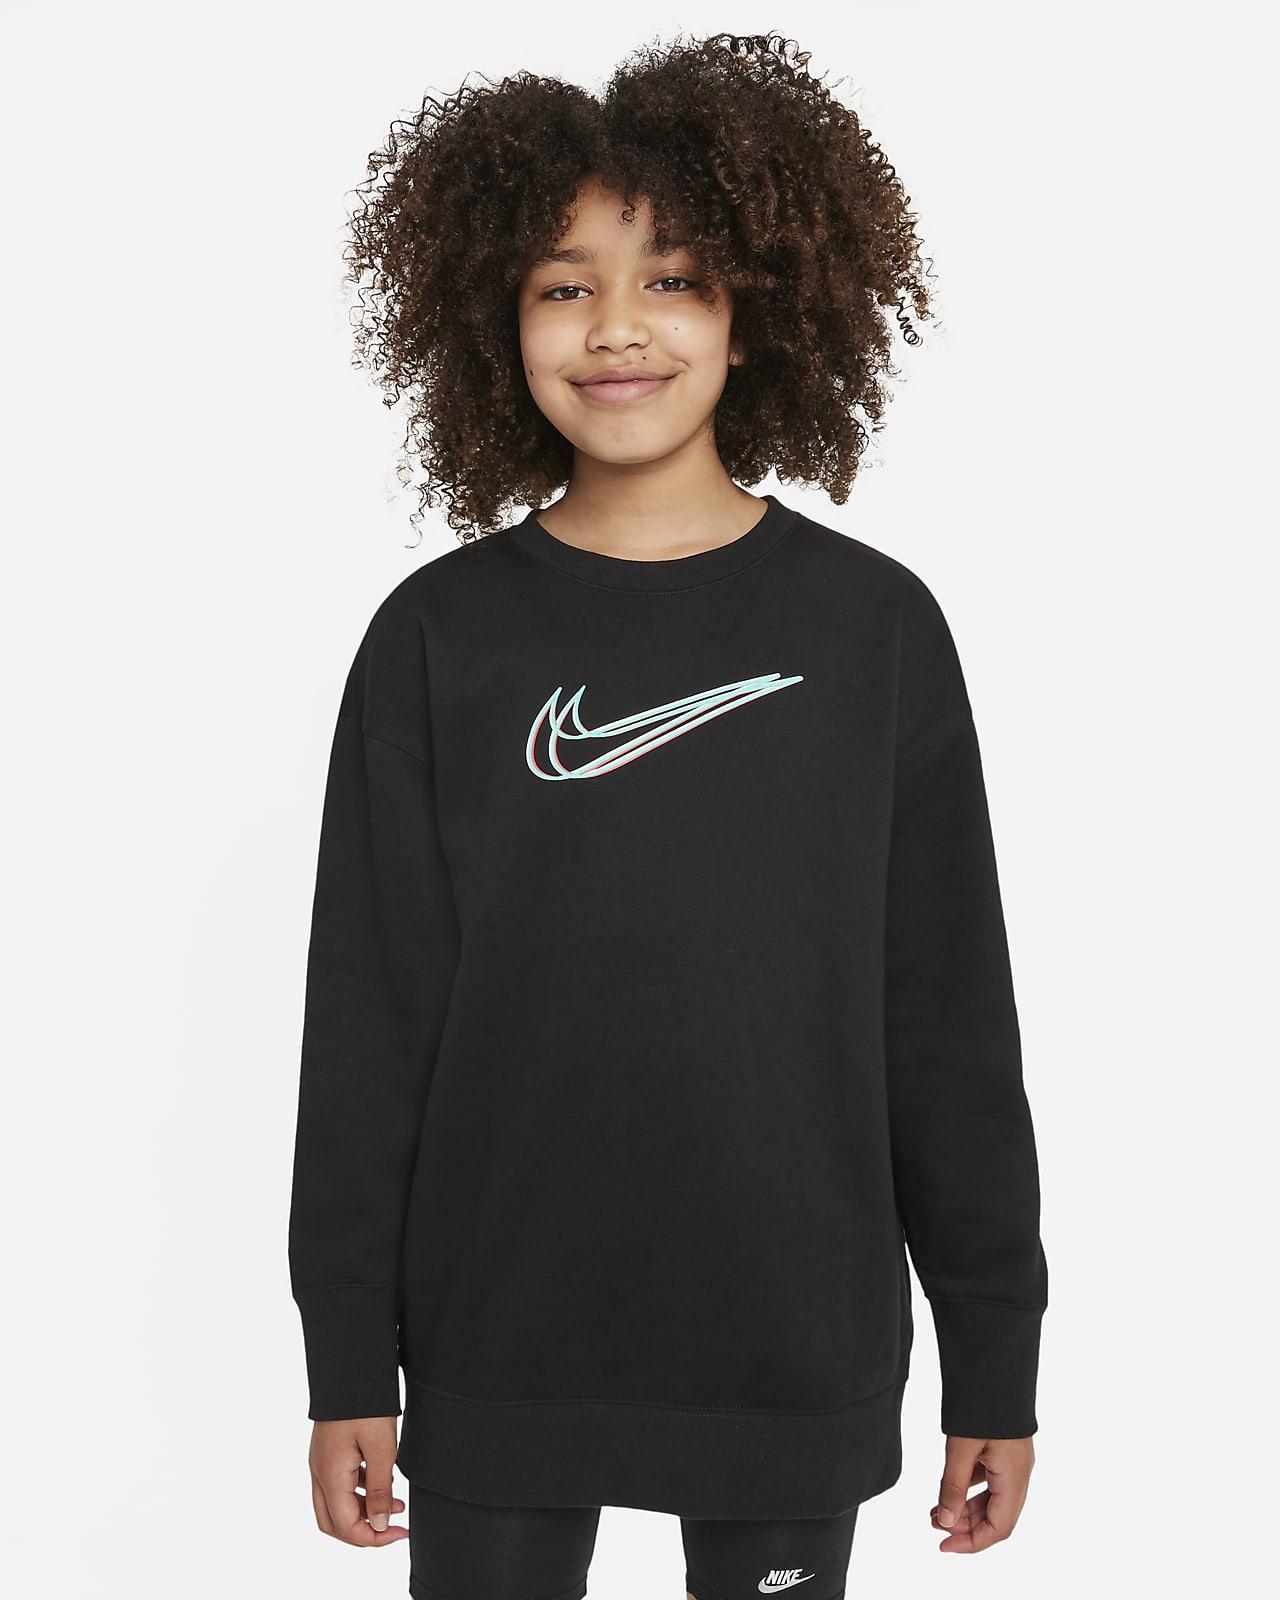 Sweatshirt de dança Nike Sportswear Júnior (Rapariga)